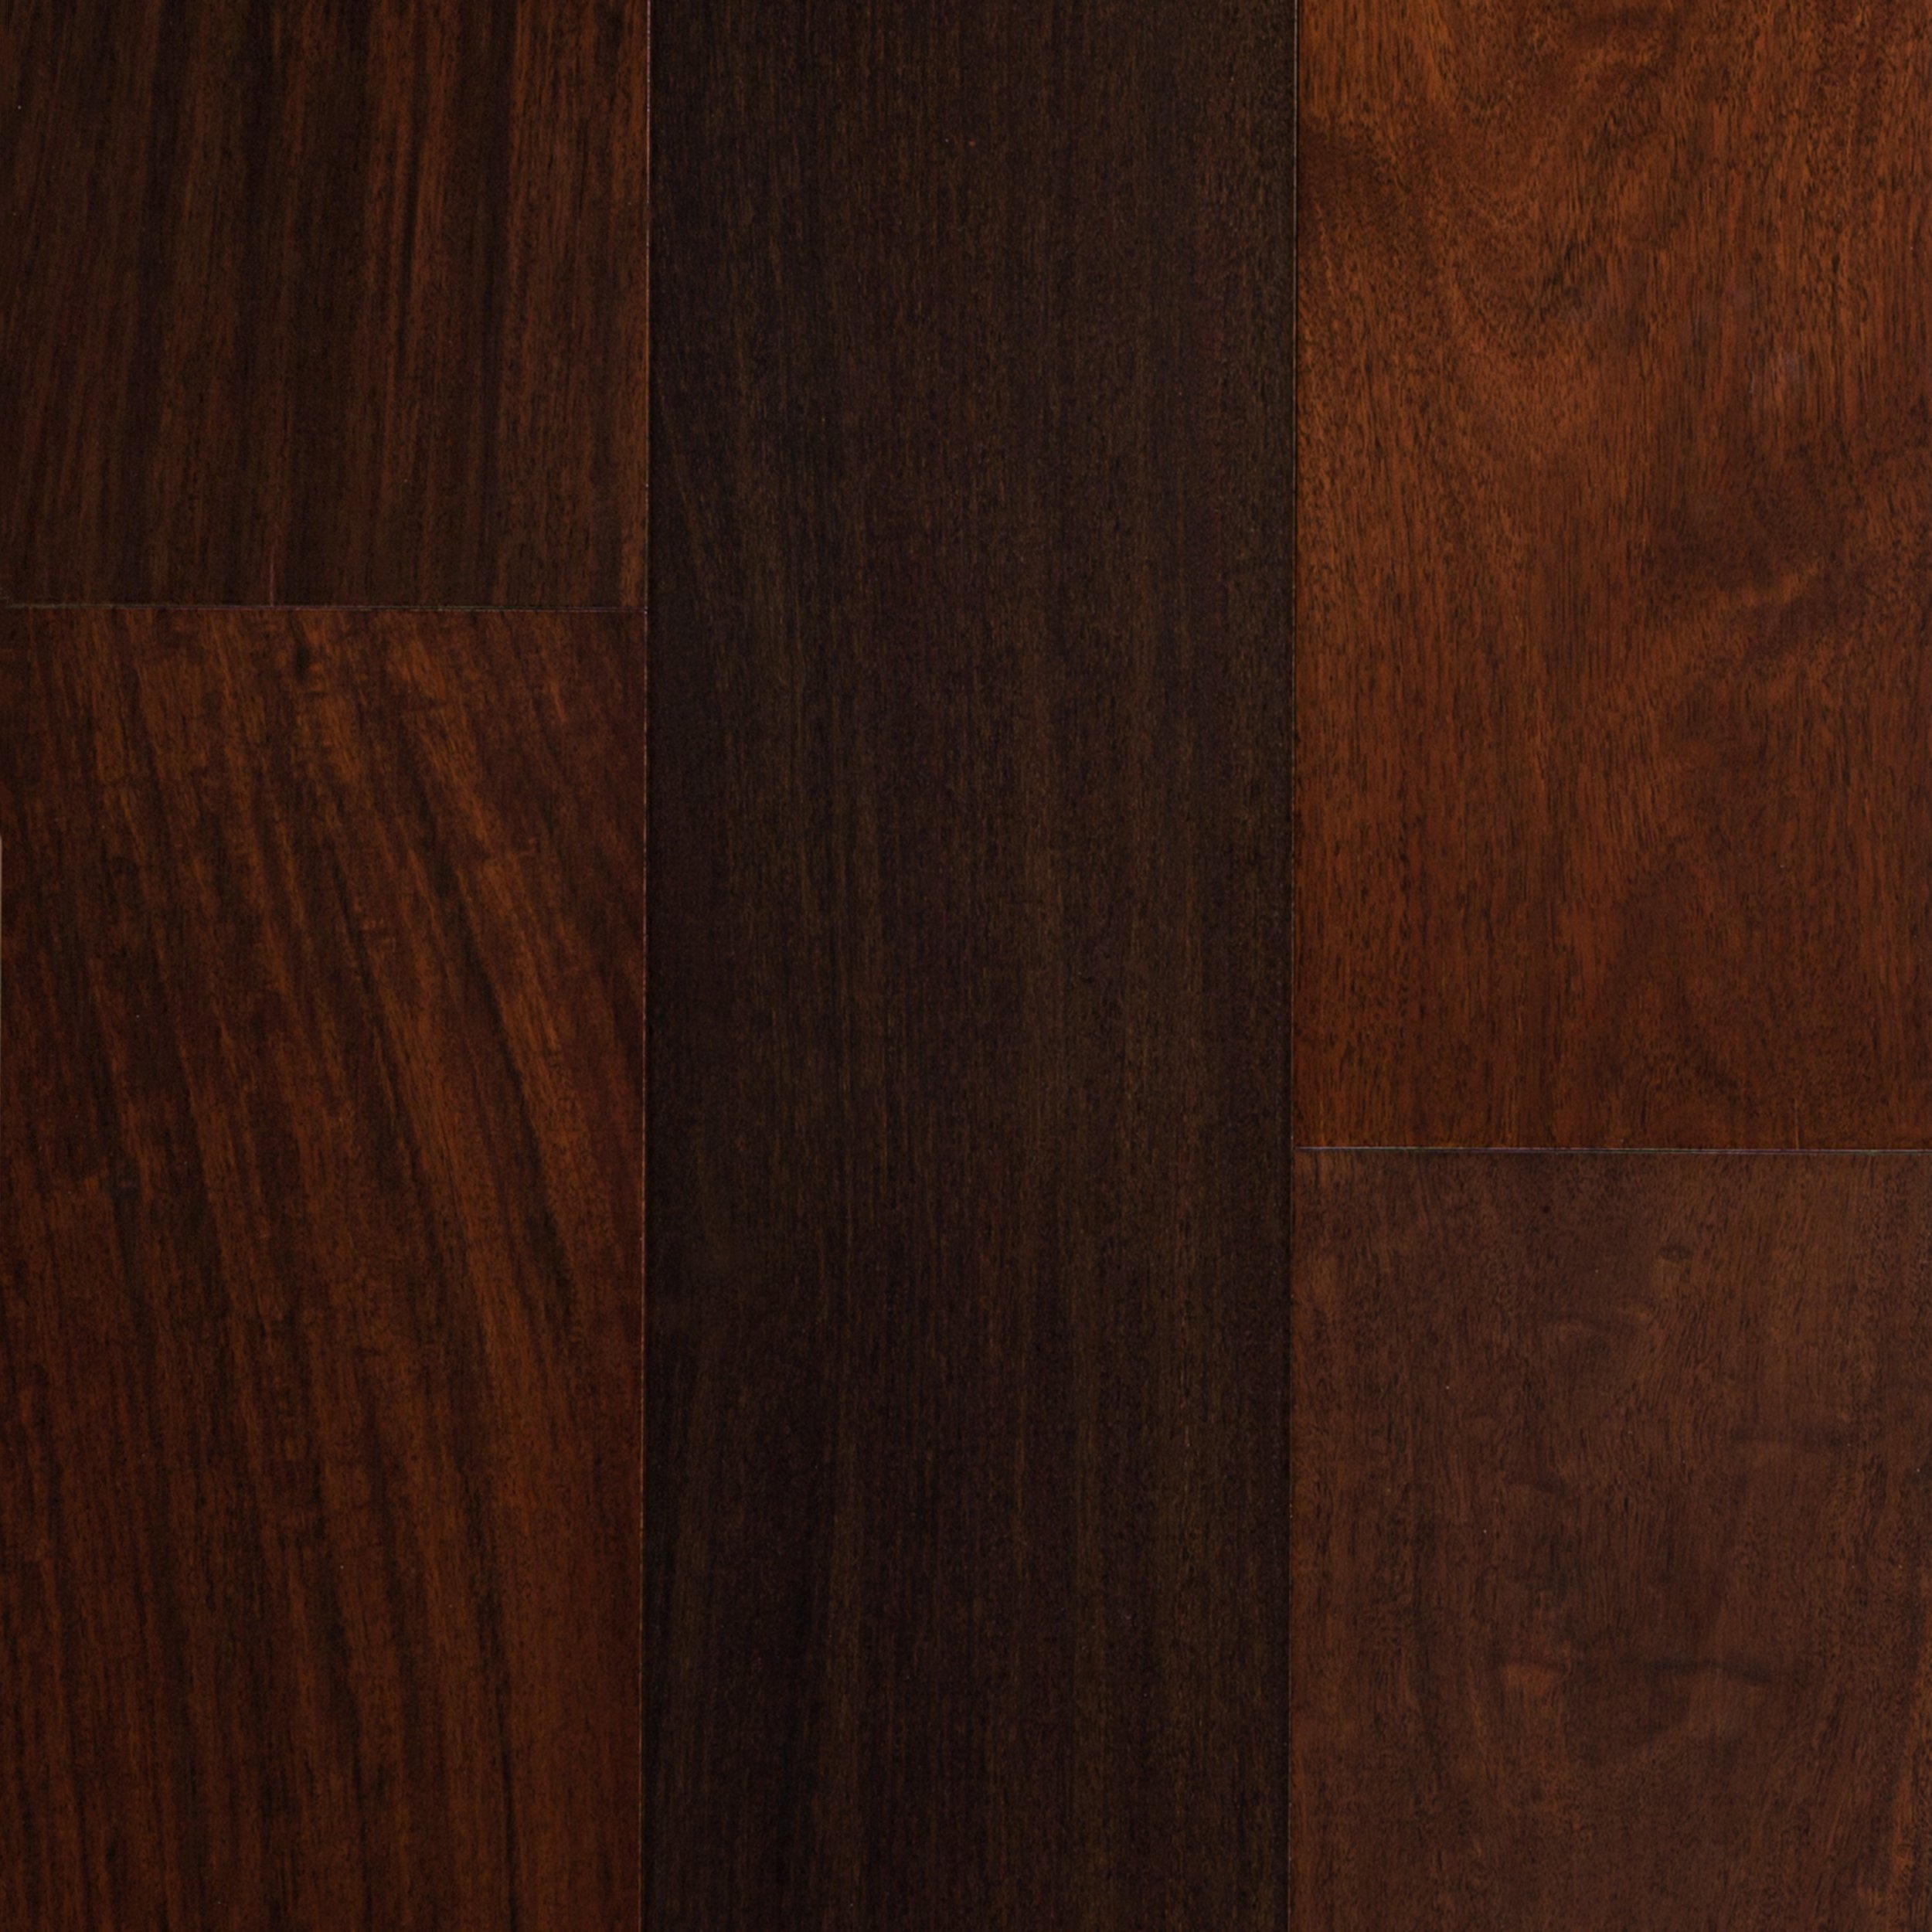 Solid Brazilian Walnut Hardwood Flooring: Walnut Wood Flooring